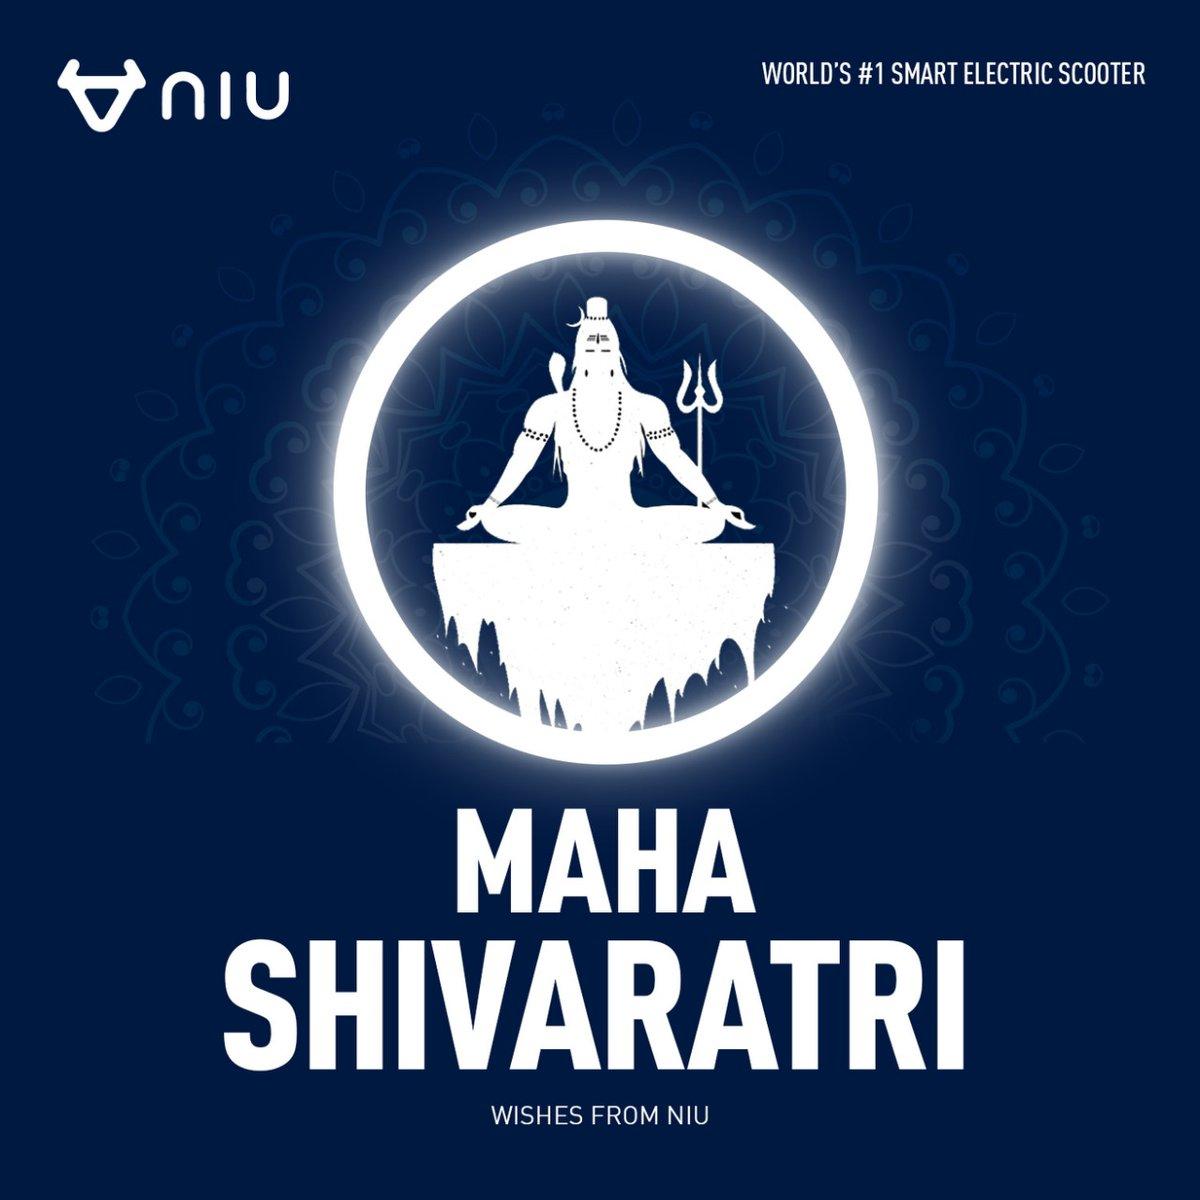 Om Namah Shivaya! Happy Maha Shivaratri! . . . . . #UnlockYourCity #NiuCrew #ANiuWayForward #NiuMobility #love #Electric #Scooterlife #ExploreNepal #Kathmandu #Nepal #EVNepal #UnlockNepal #NiuRiders #Nepaltraveller #NiuGeneration #Climatechange #CleanAirNow  #GreenWarriors